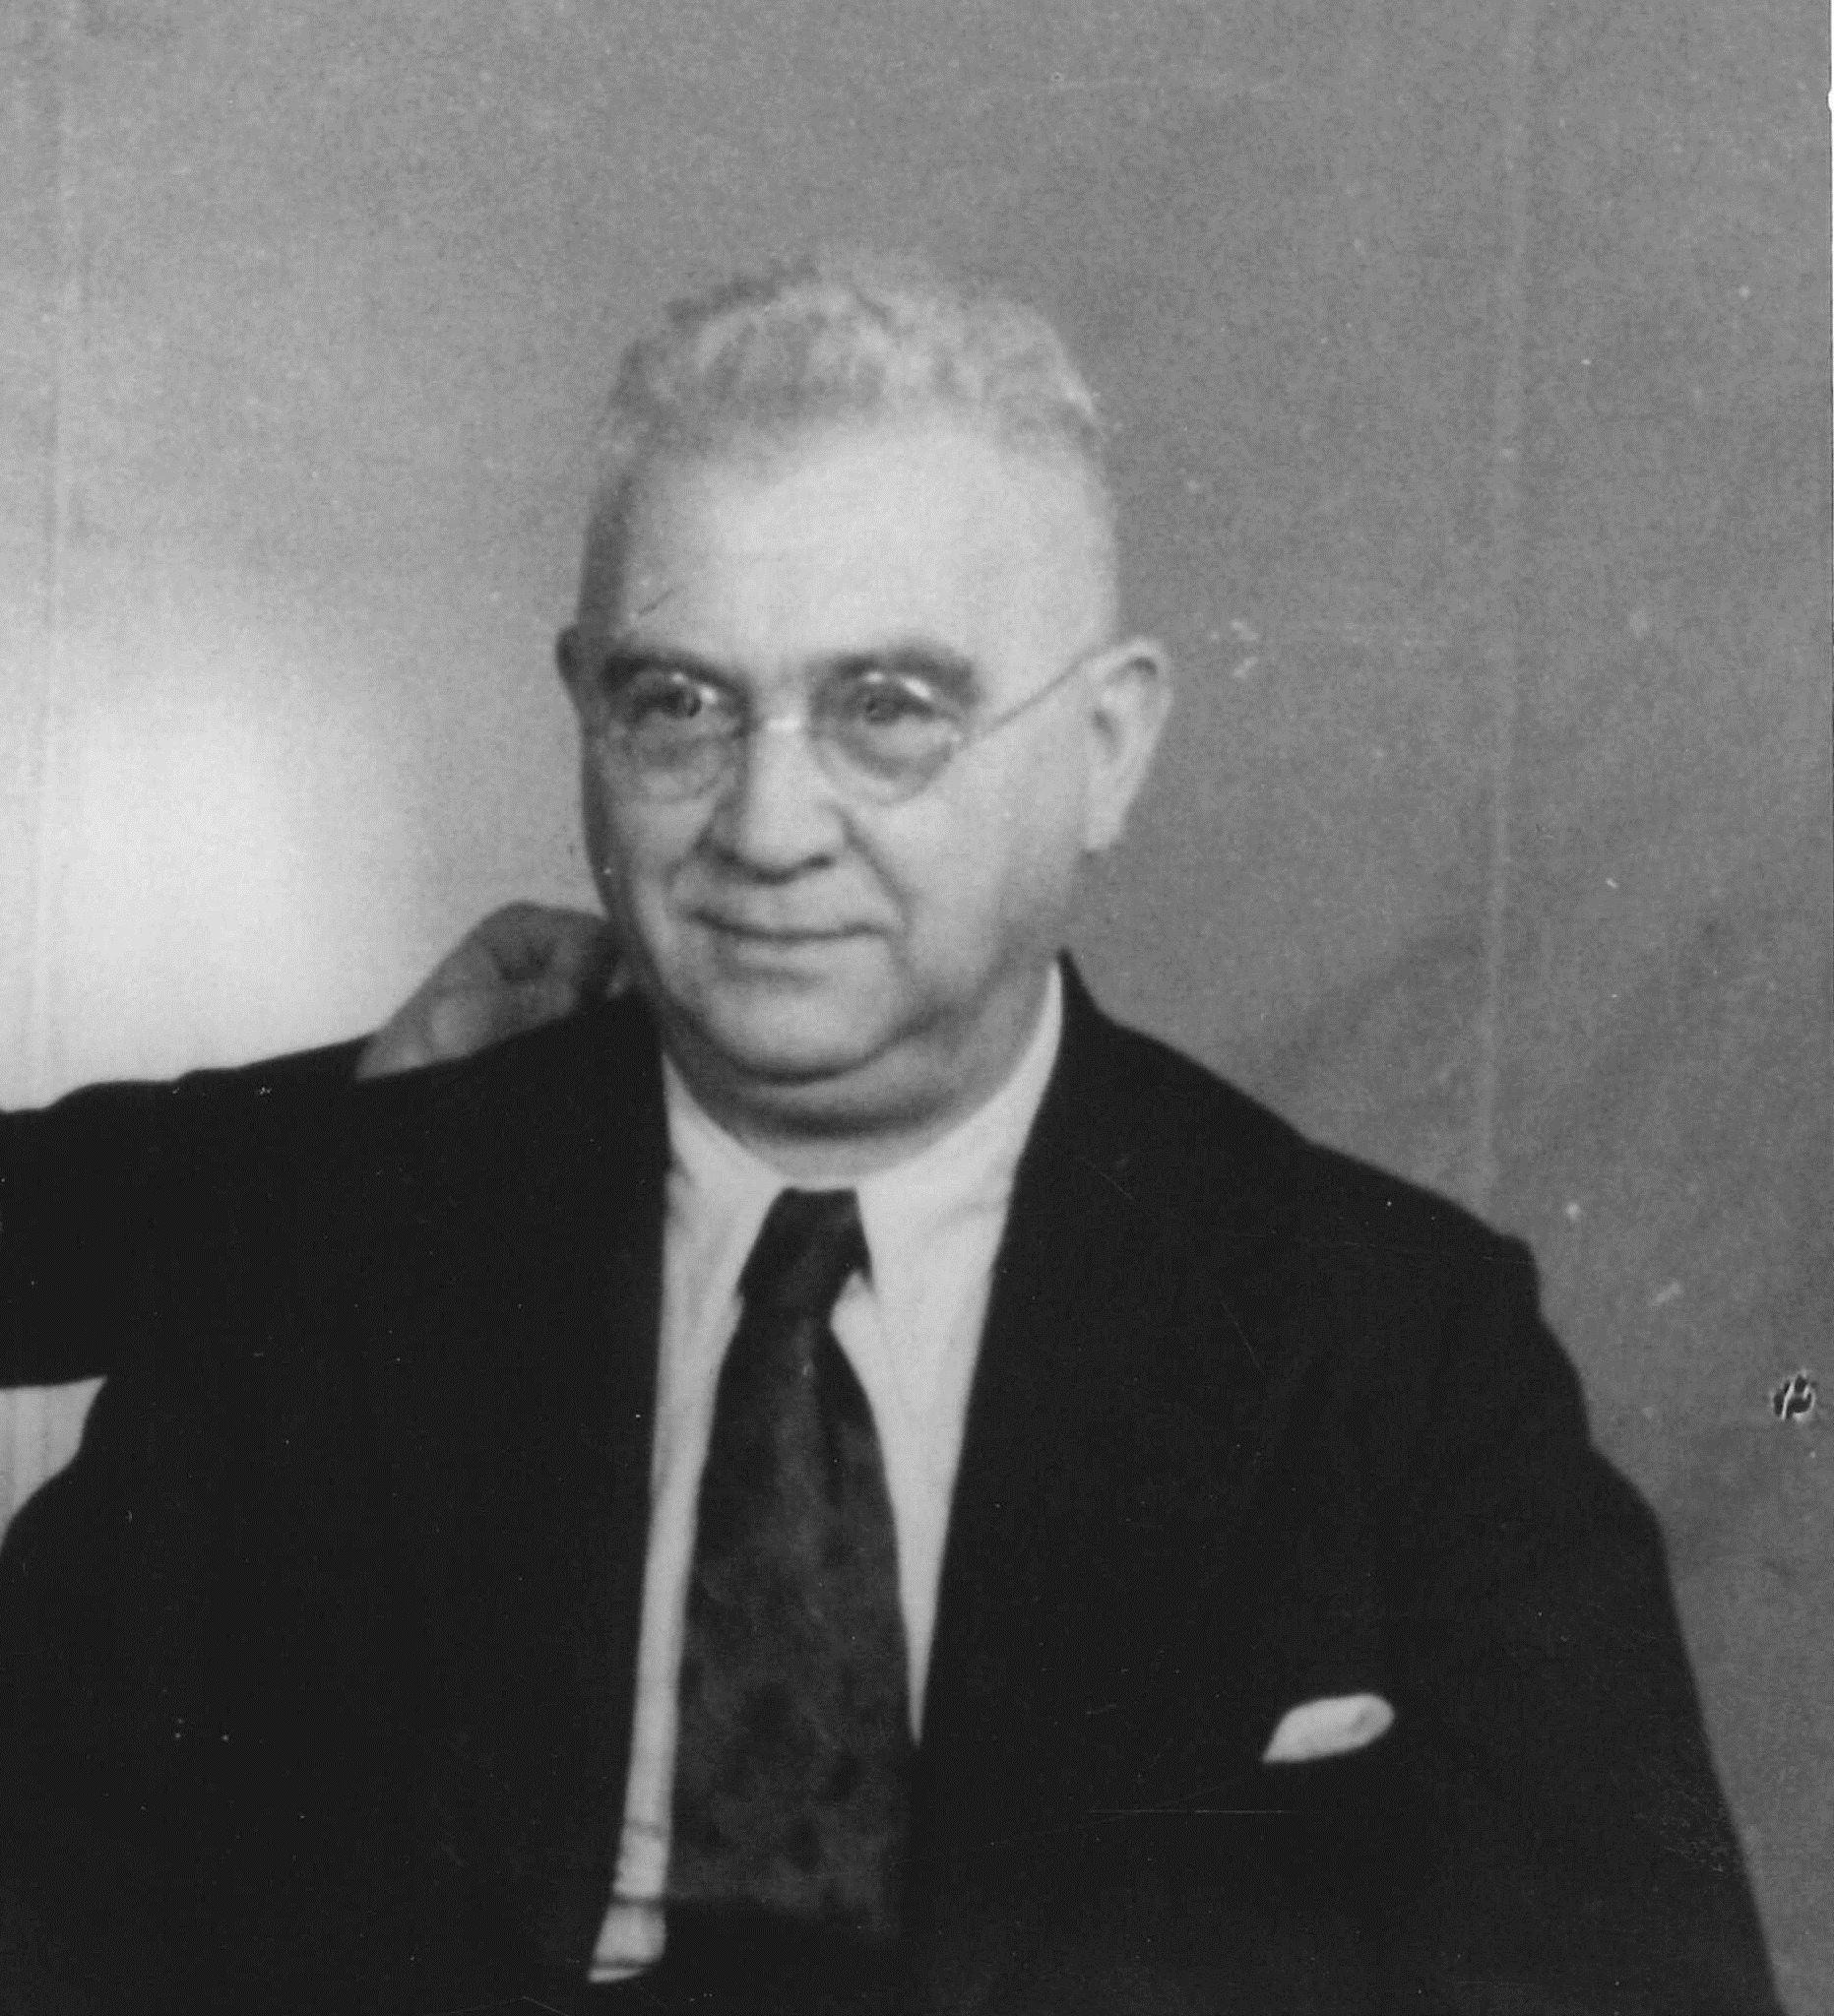 Bürgermeister Peter Klingler, Sozialdemokrat, um 1950